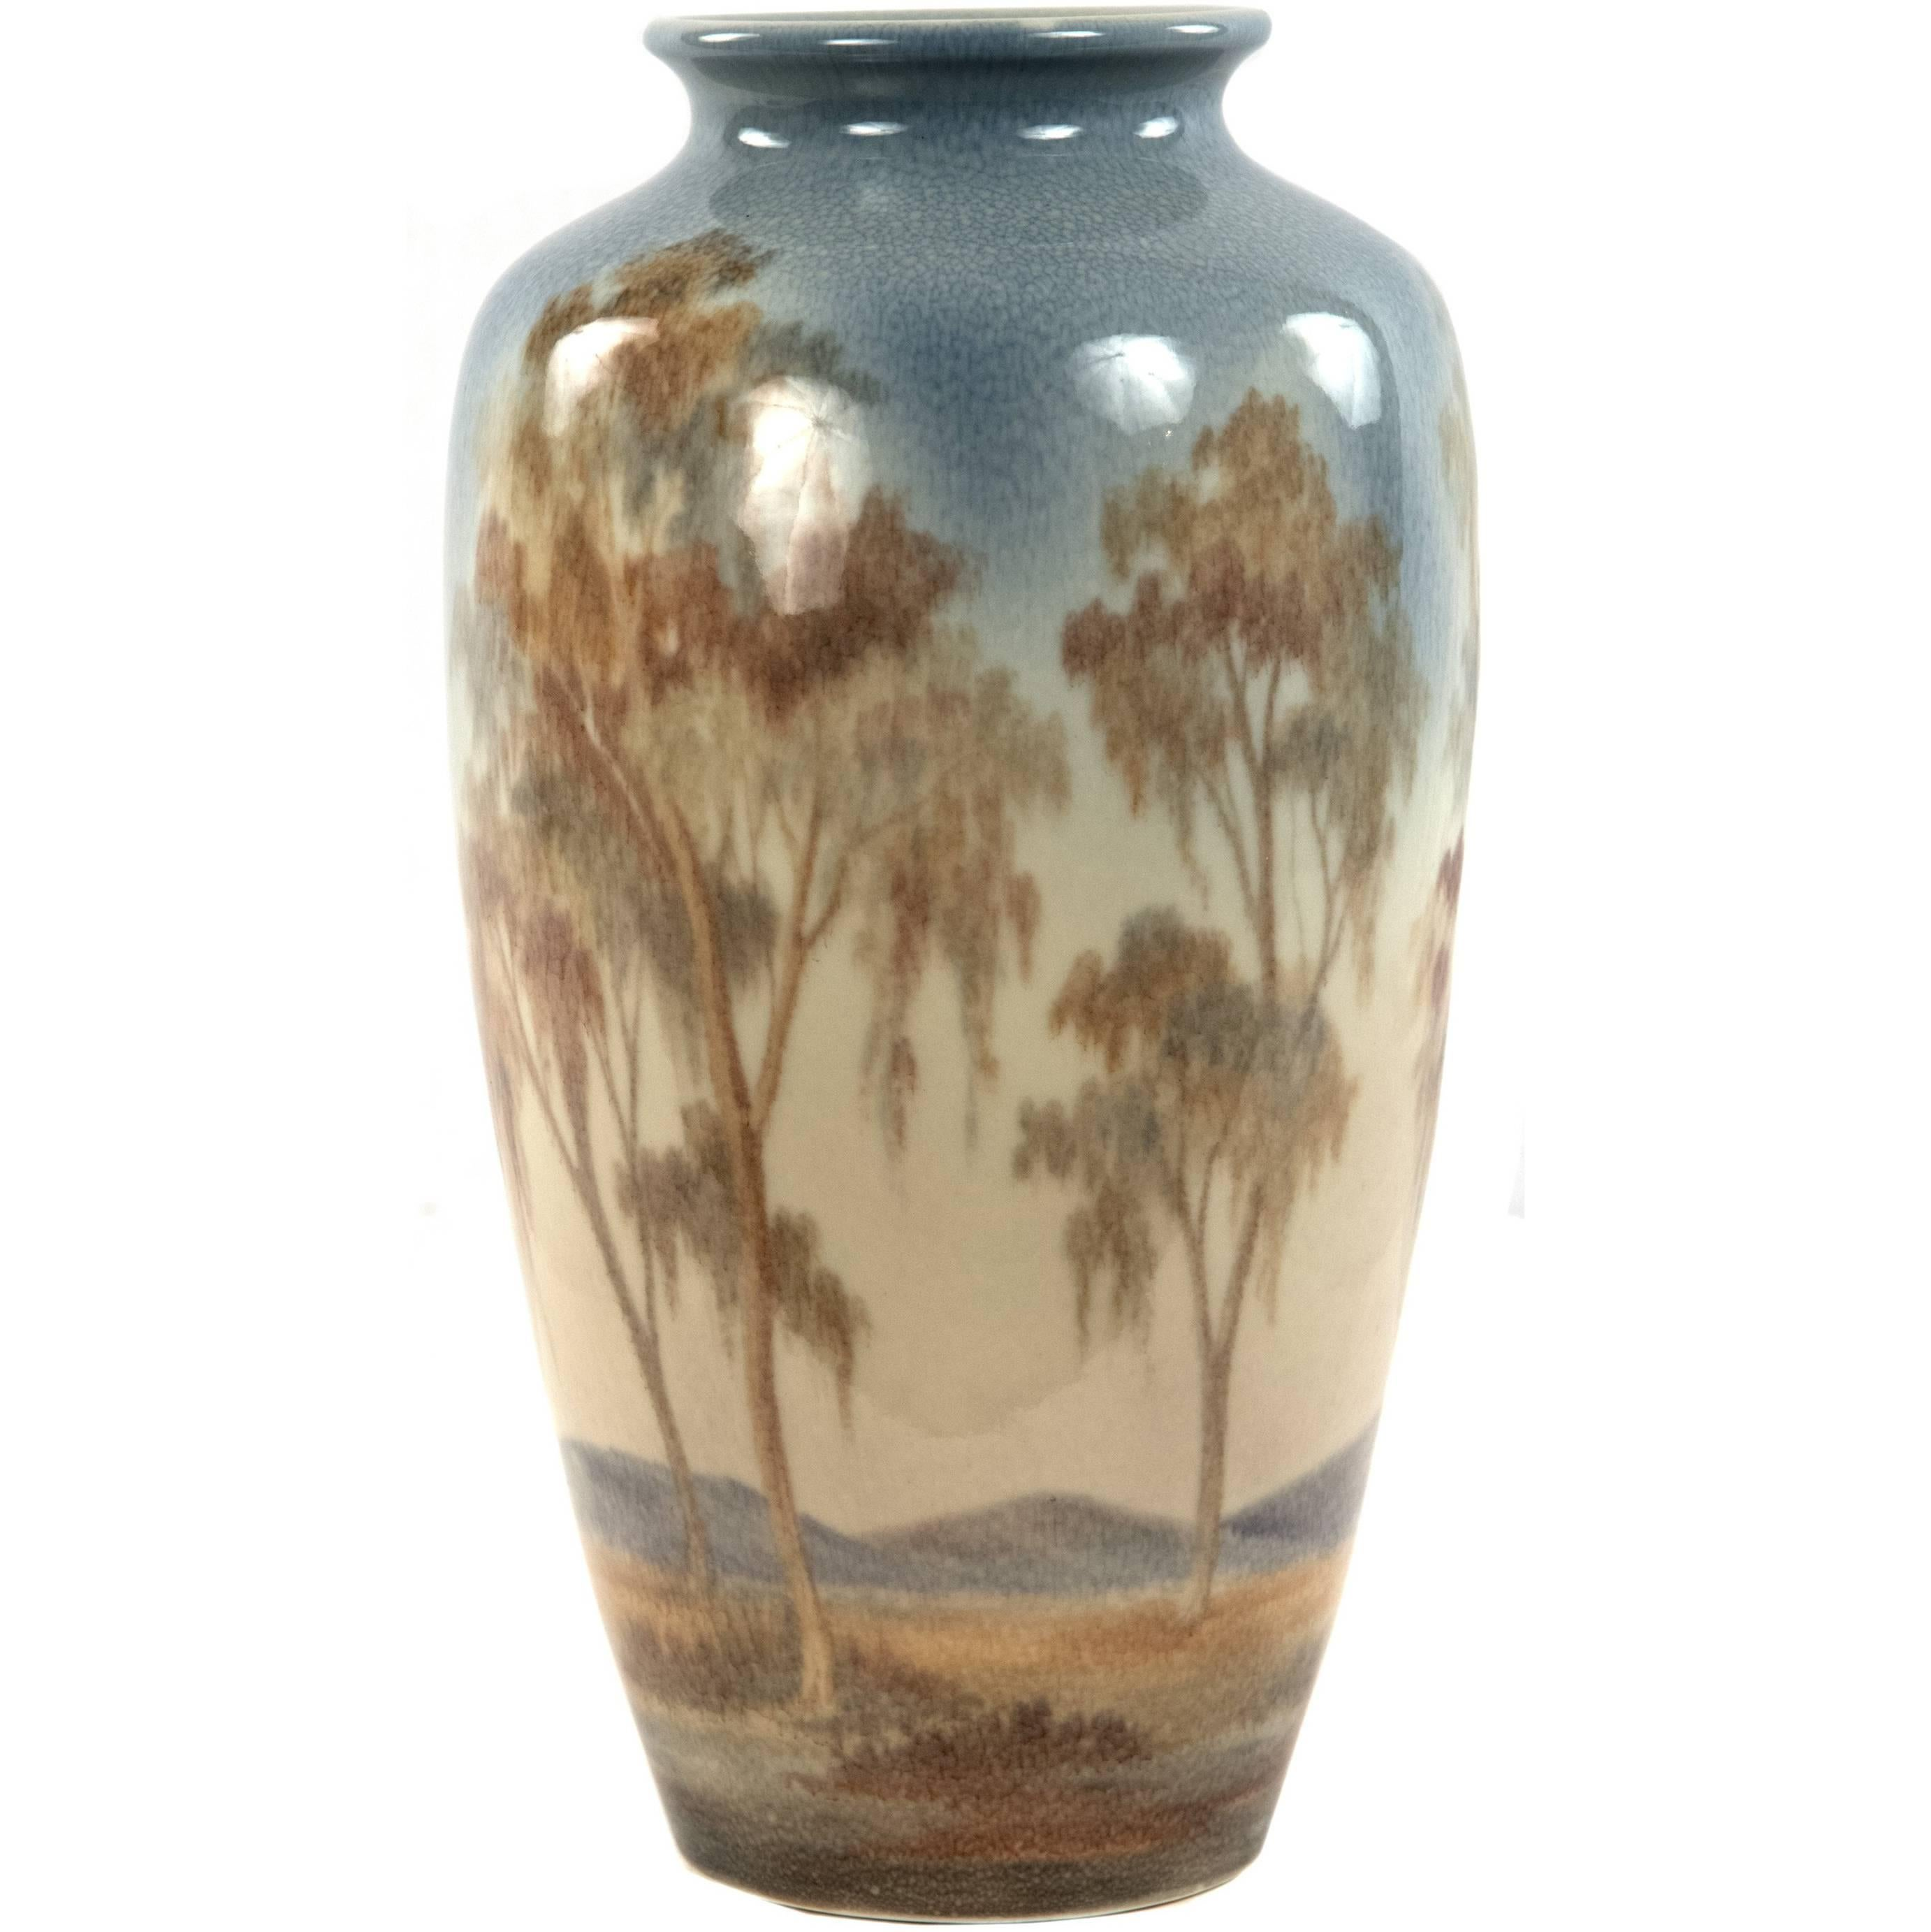 Rookwood Vellum Glazed Landscape Vase by Margaret McDonald